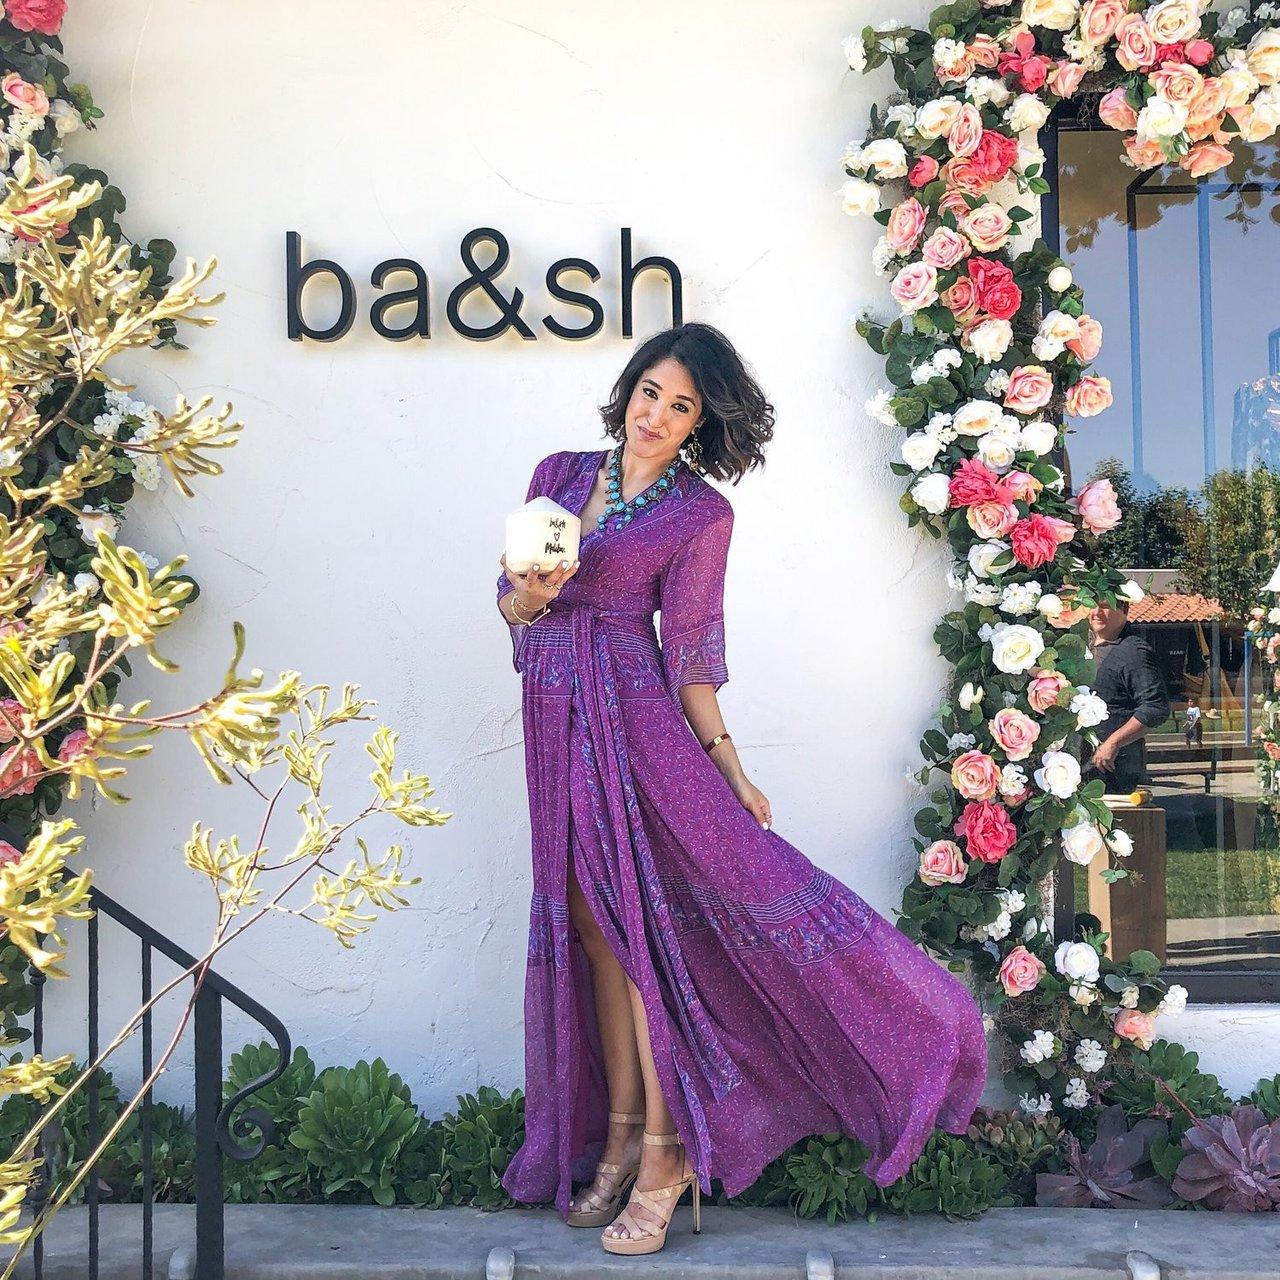 ba&sh Malibu Store Launch photo IMG_8693.jpg